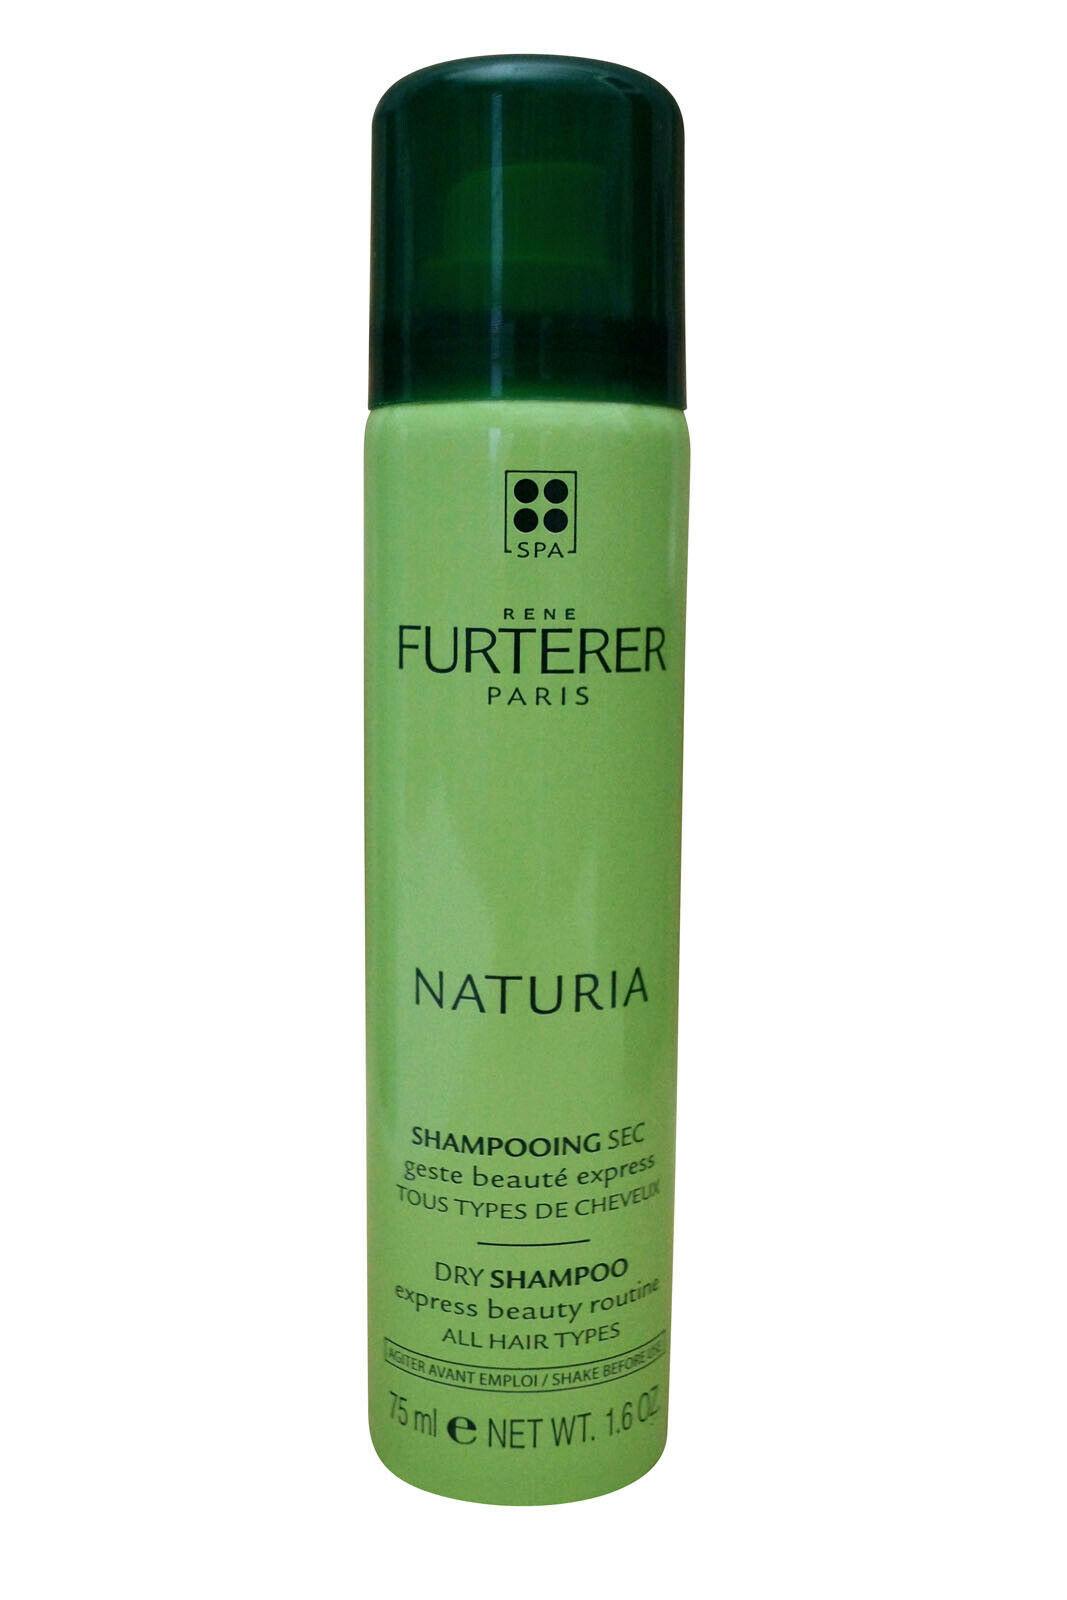 Rene Furterer Naturia Dry Shampoo All Hair Types 1.6 OZ - $12.24